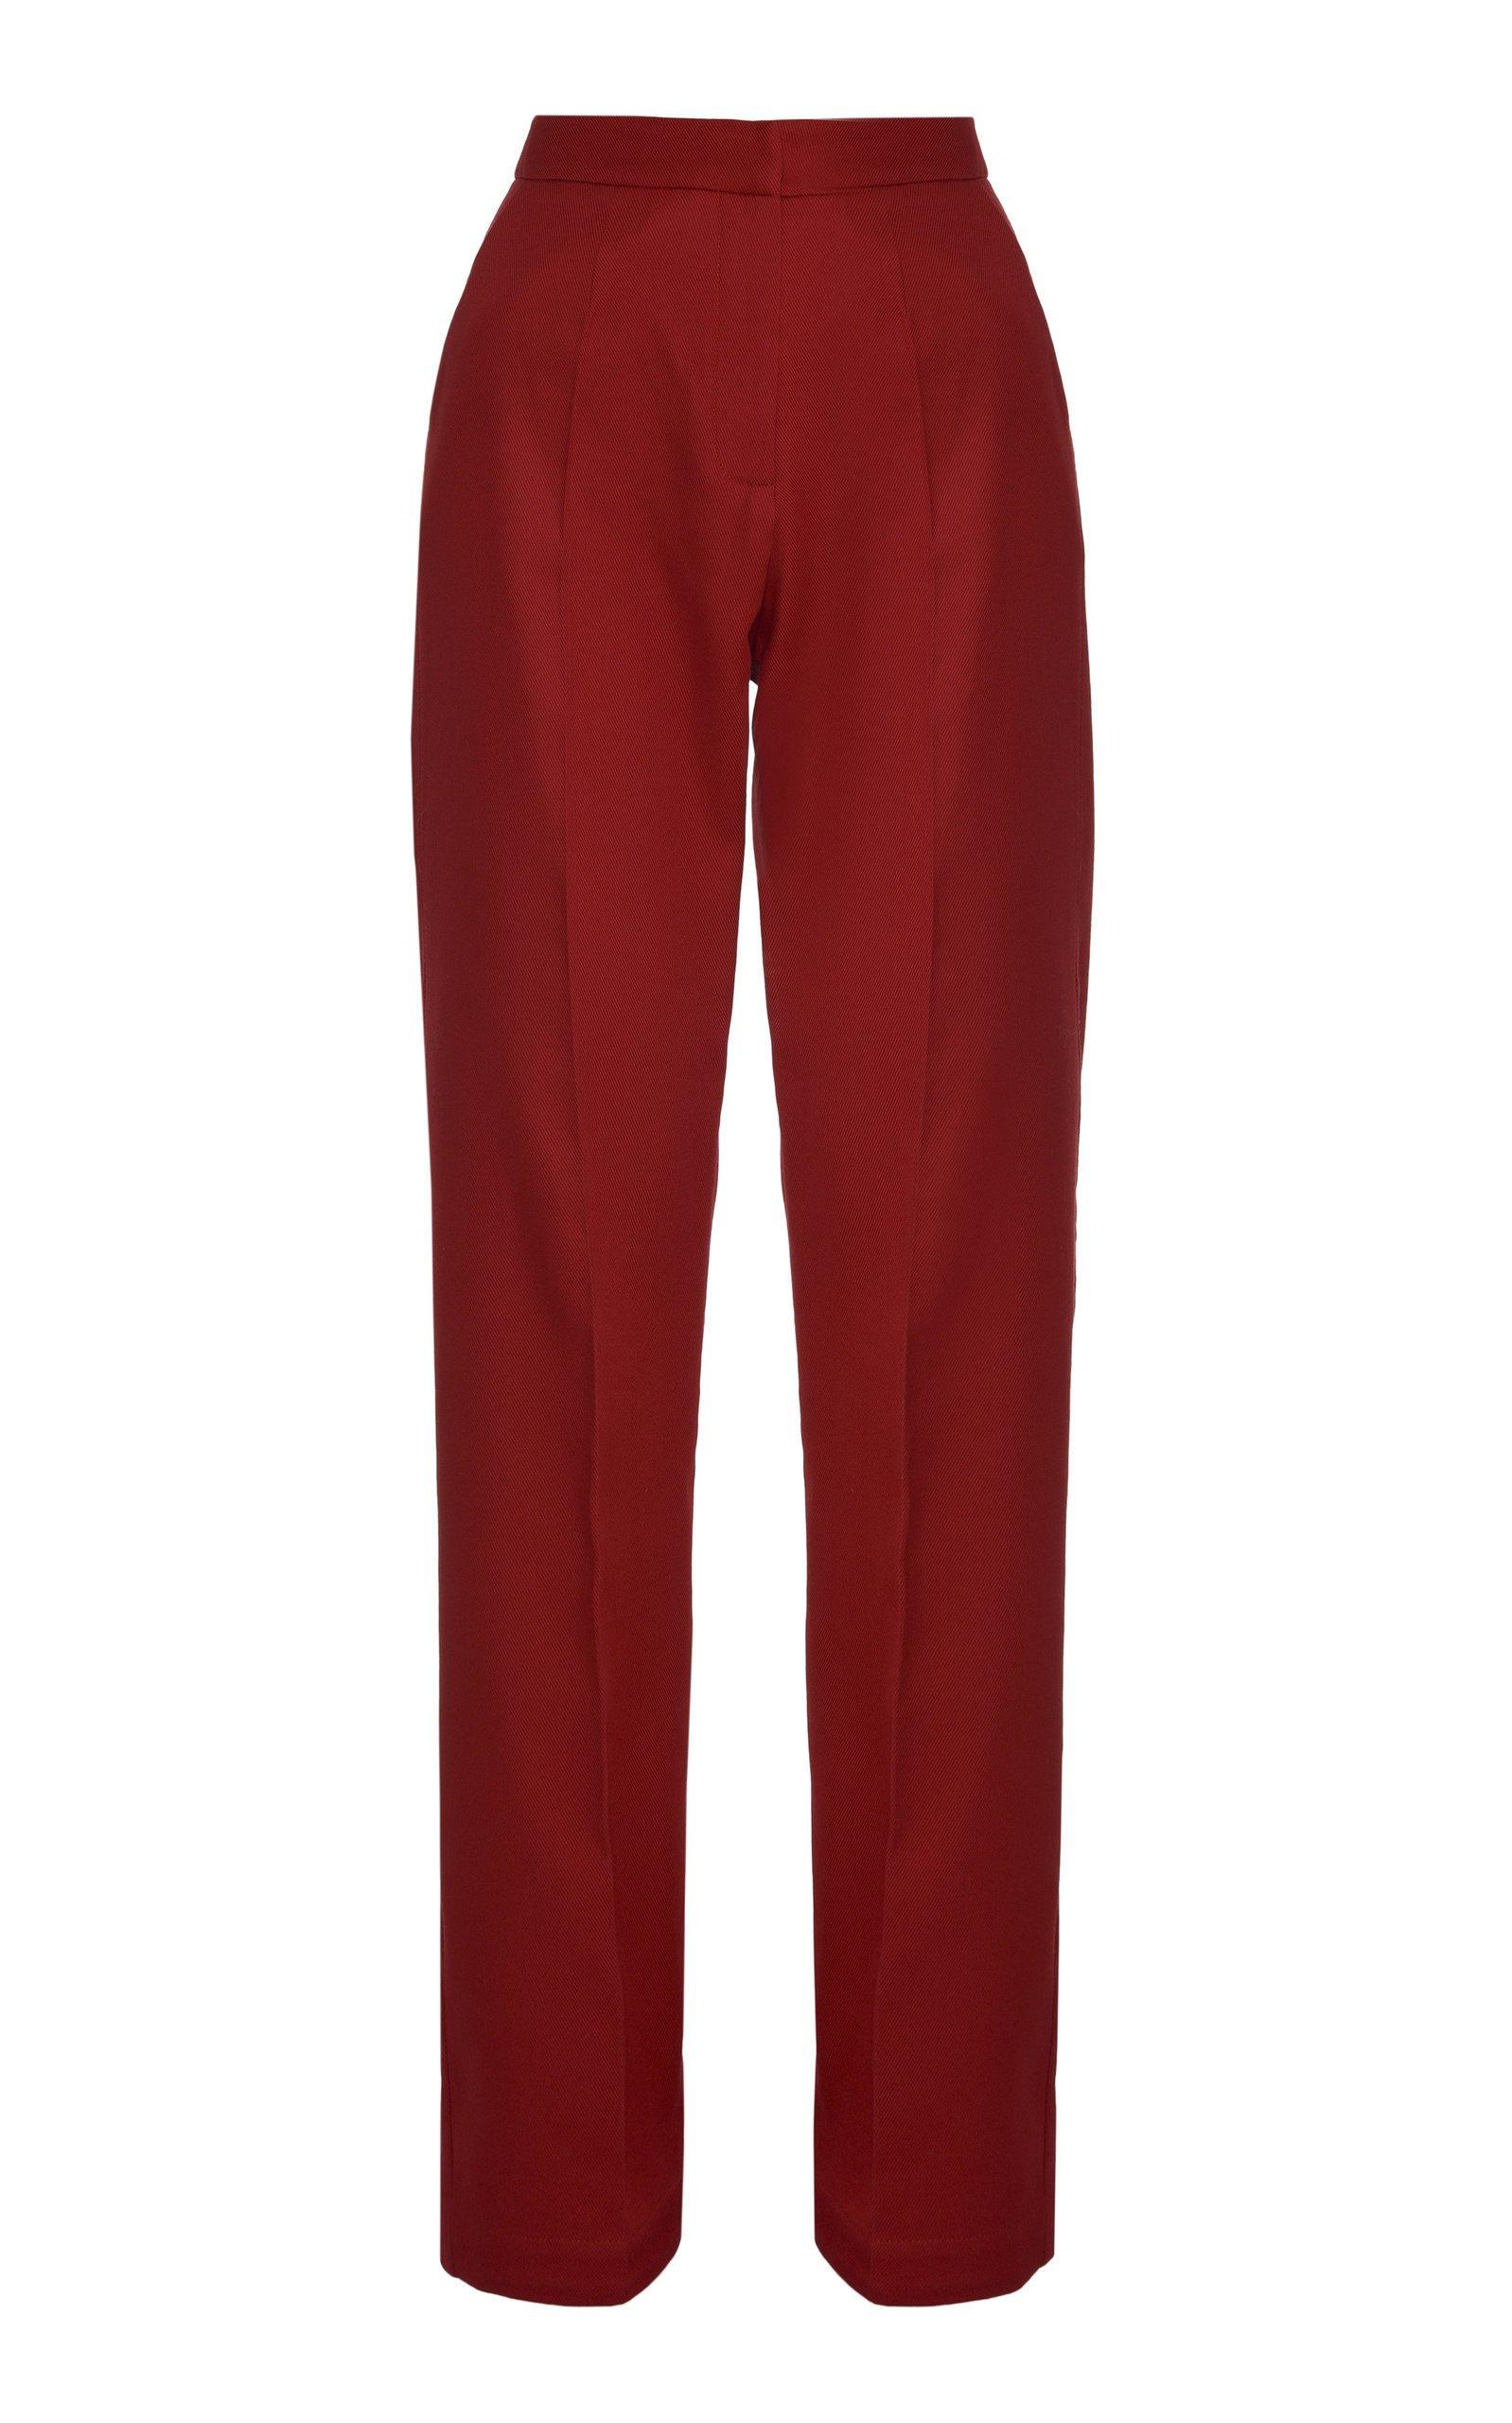 Lado Bokuchava Straight Leg Cotton Pants